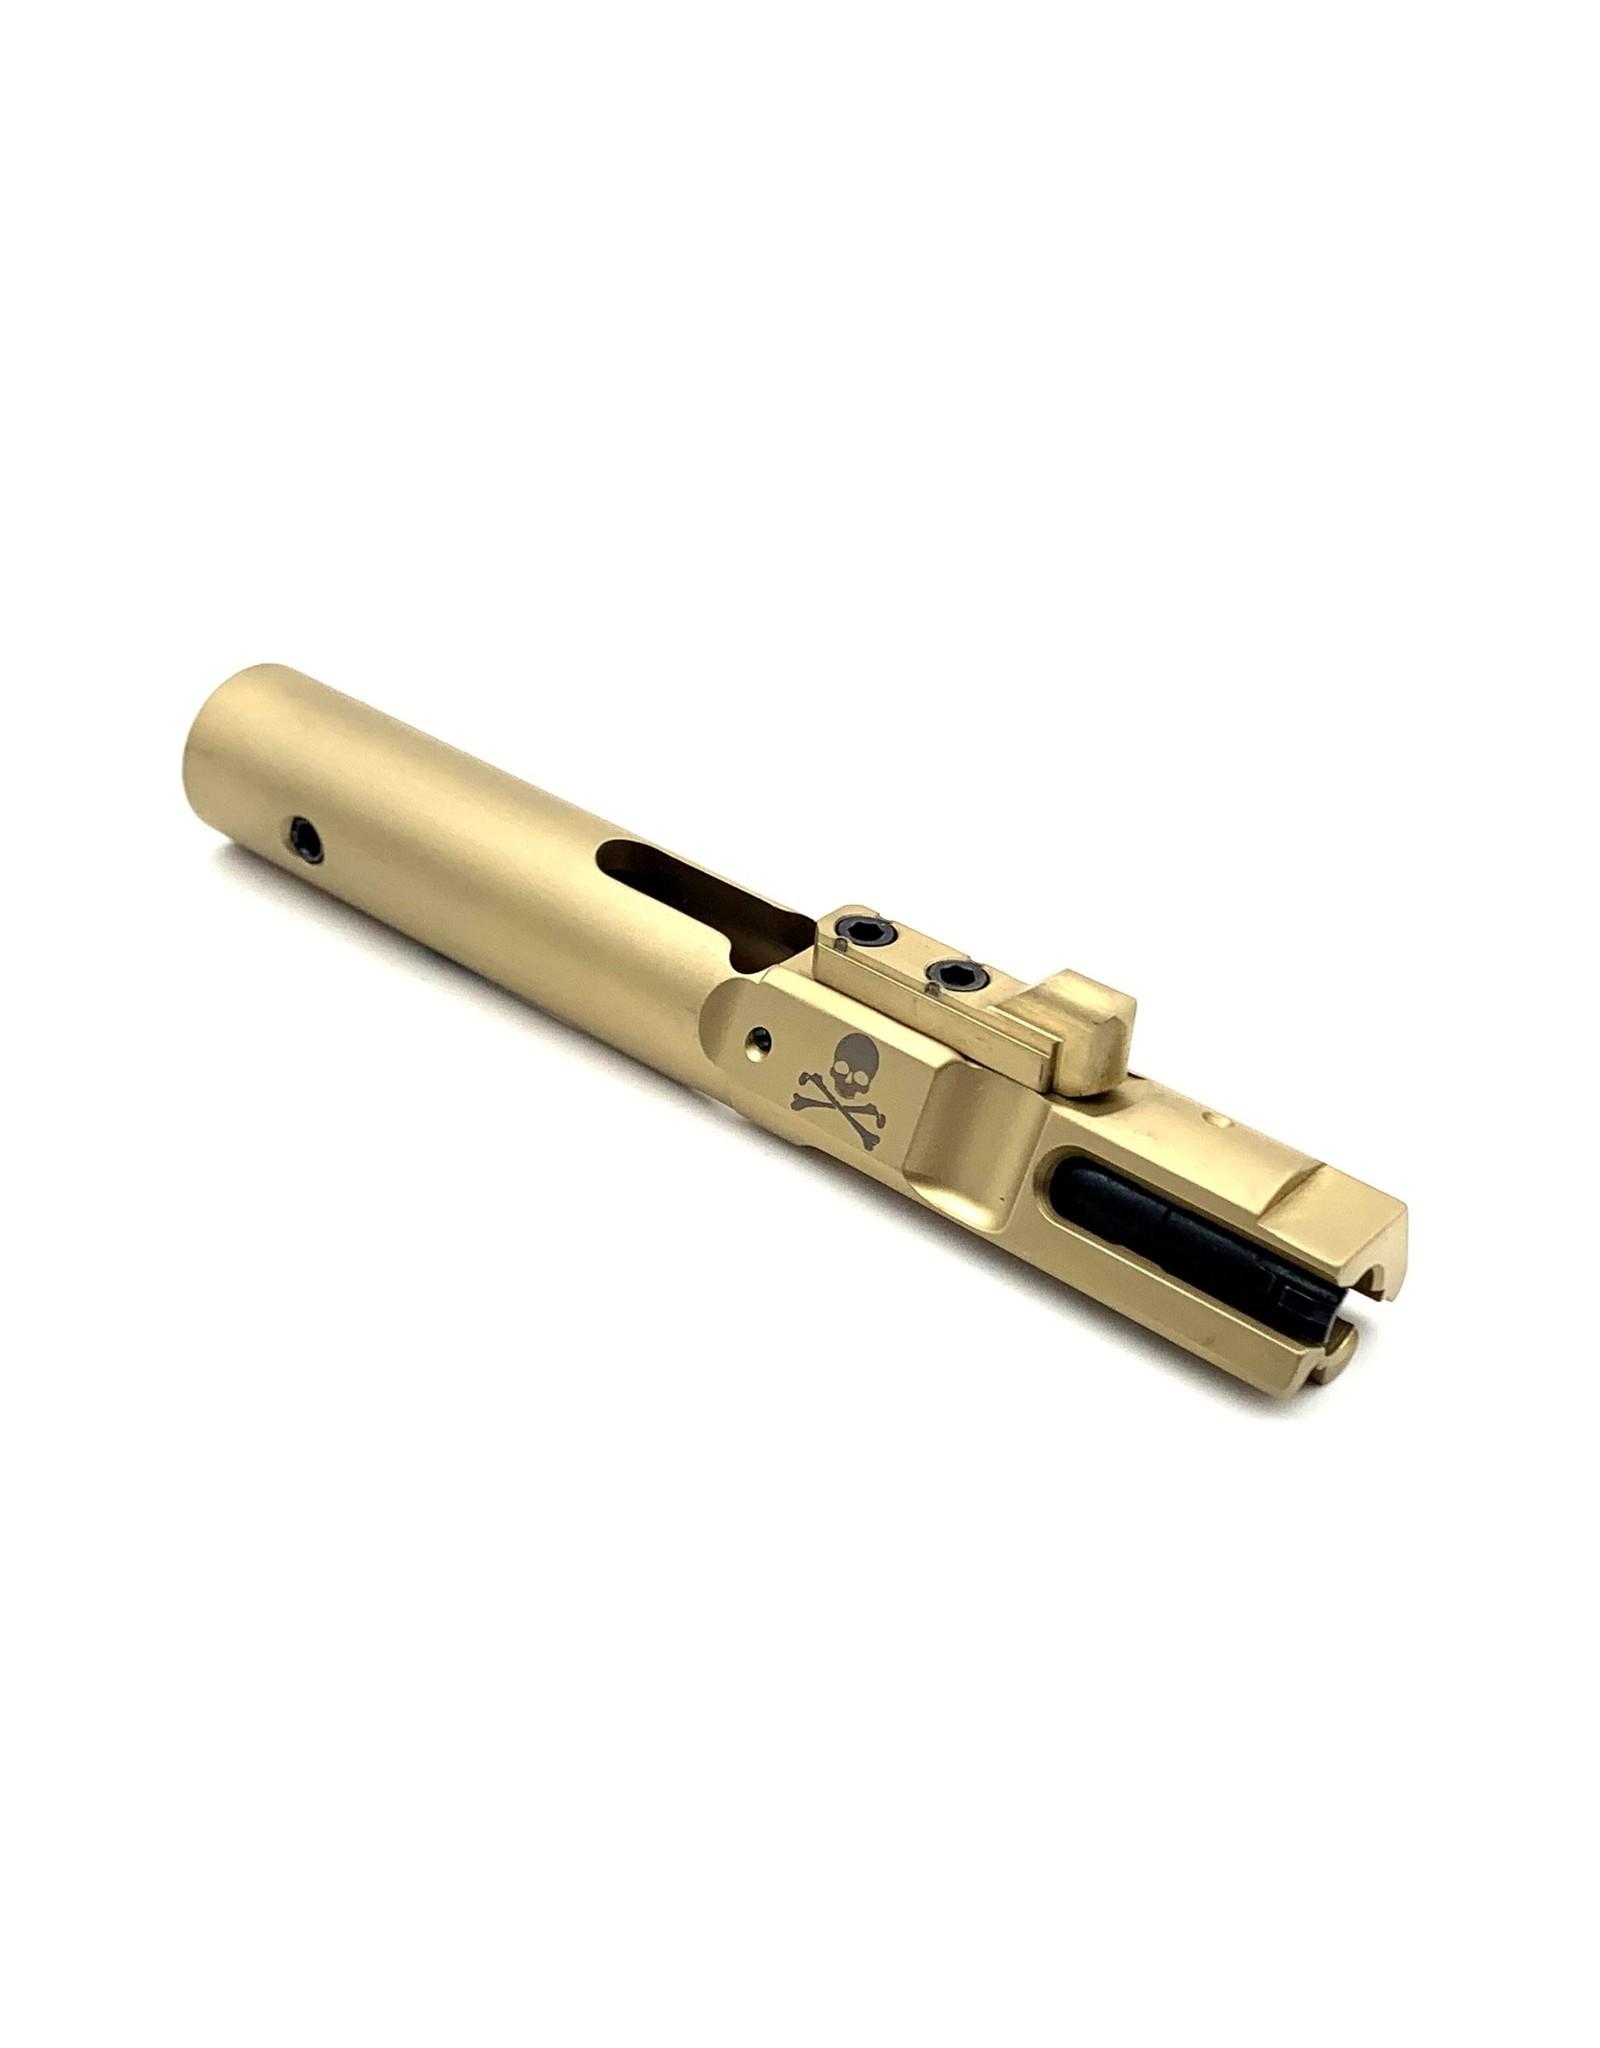 SDT 9mm Bolt Carrier Group (BCG) - Titanium Nitride